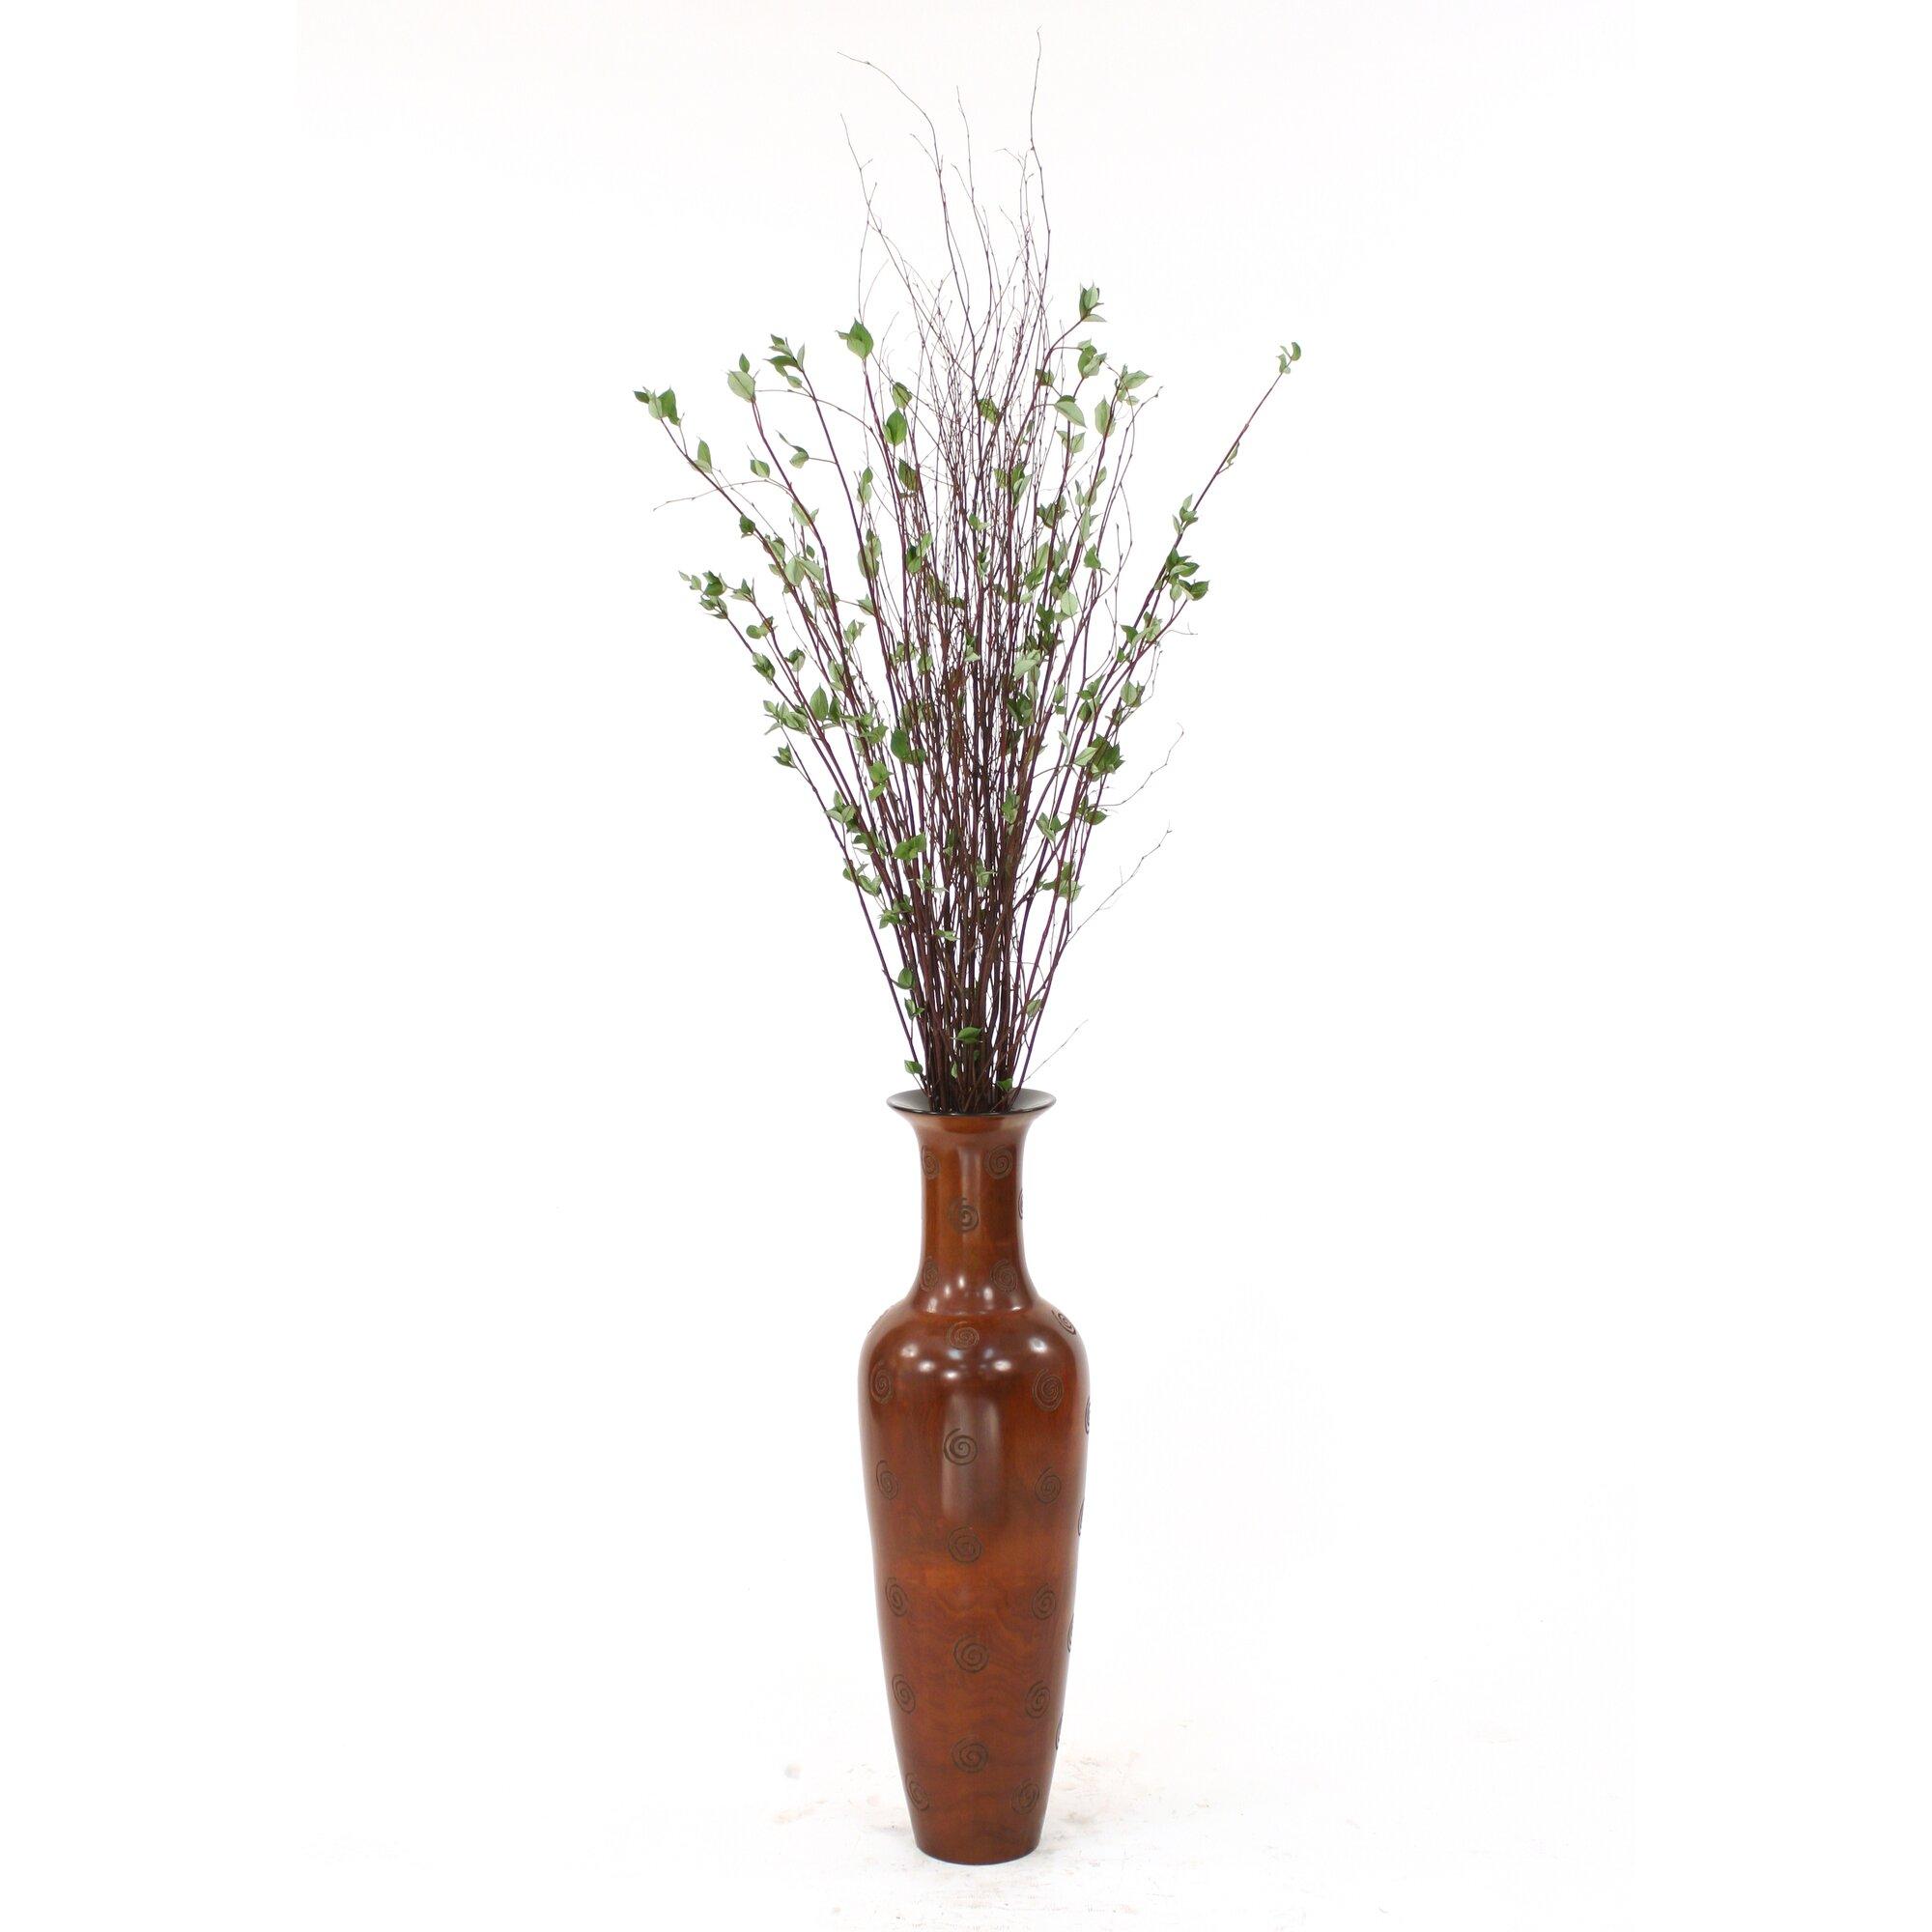 Decorative stems for vases instadecor decorative stems for vases reviewsmspy